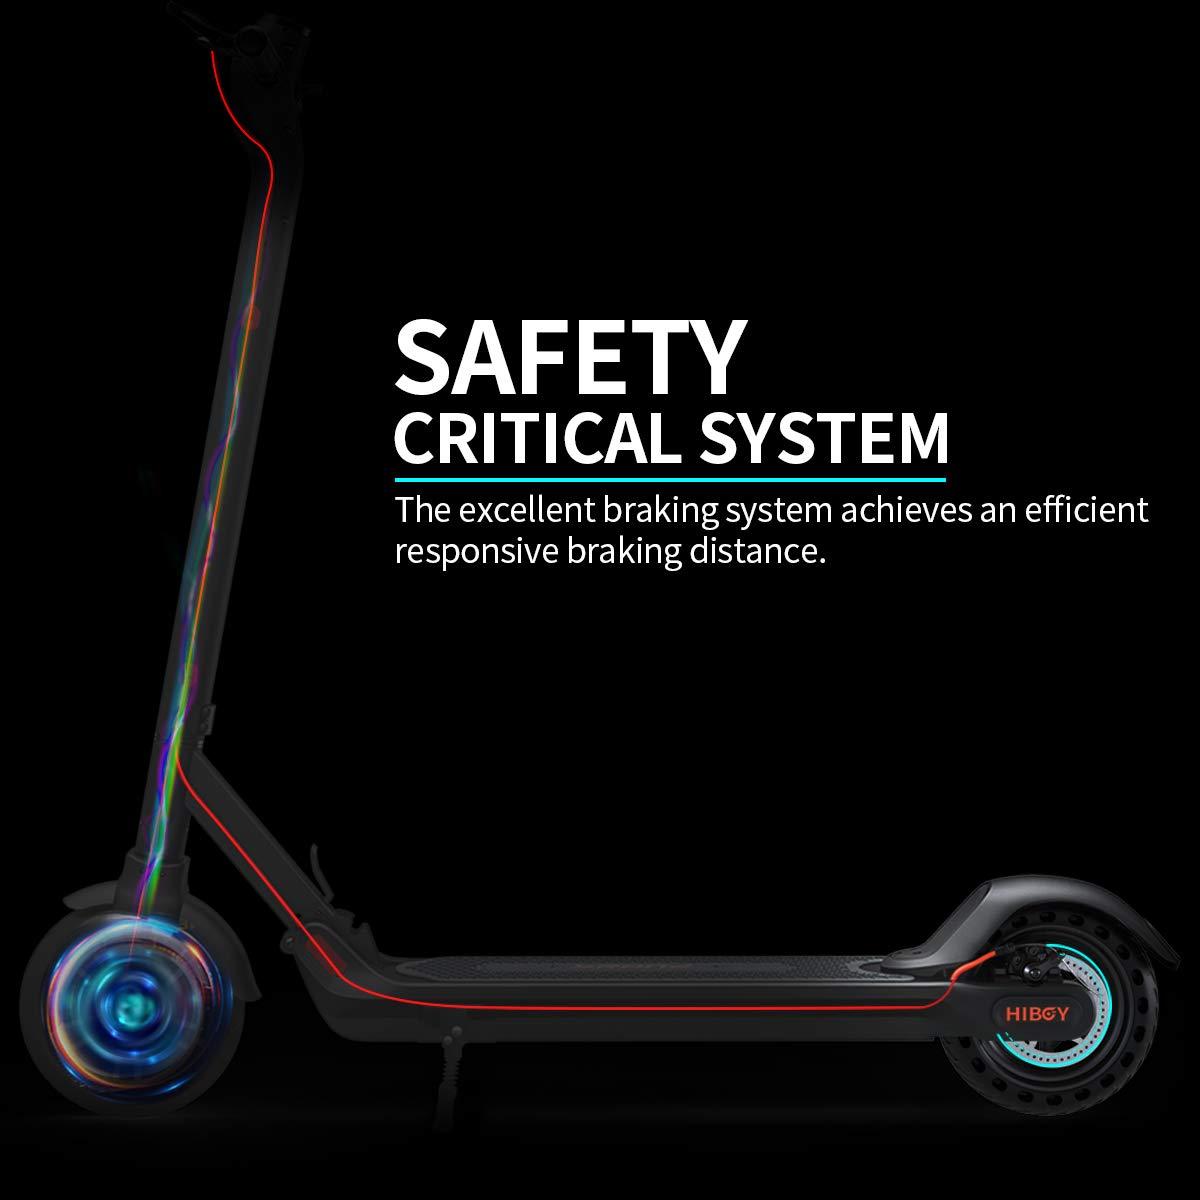 Amazon.com: Hiboy MAX Scooter eléctrico – Motor de 350 W 8.5 ...